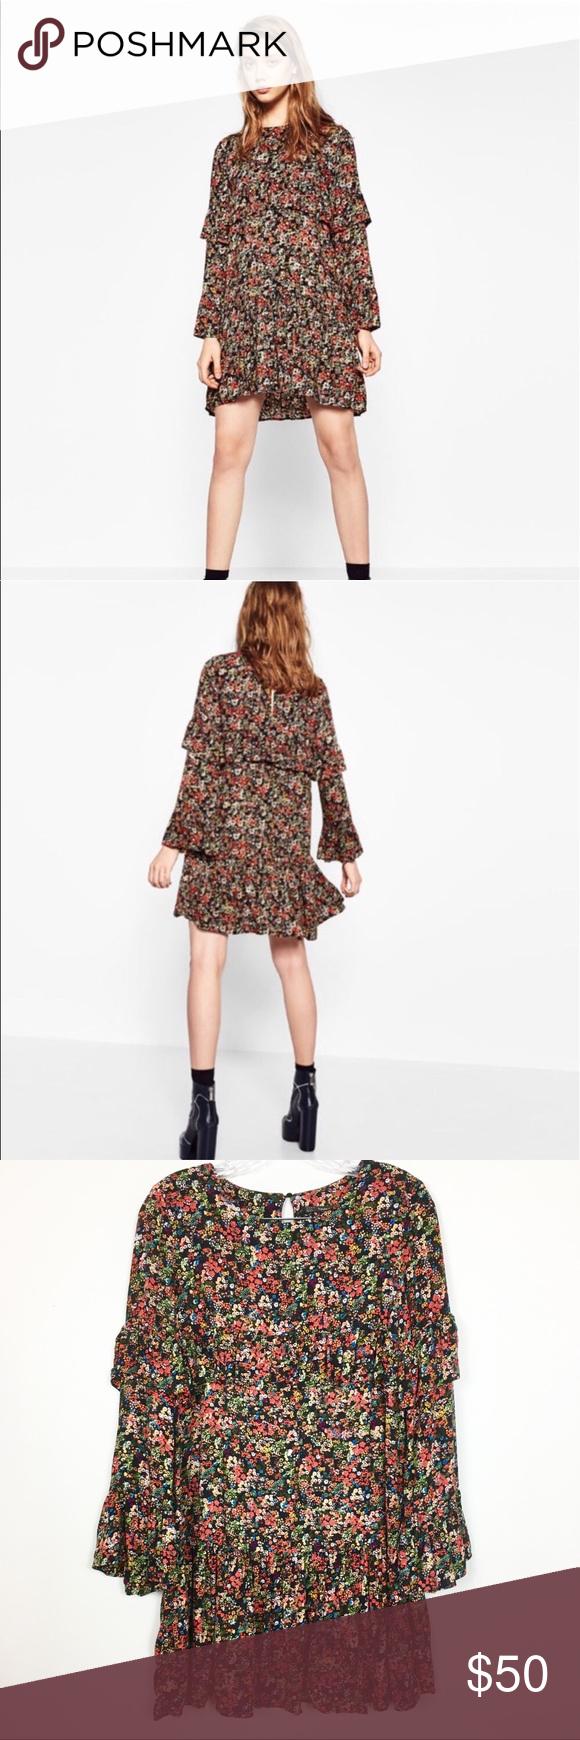 Zara Floral Ruffle Dress